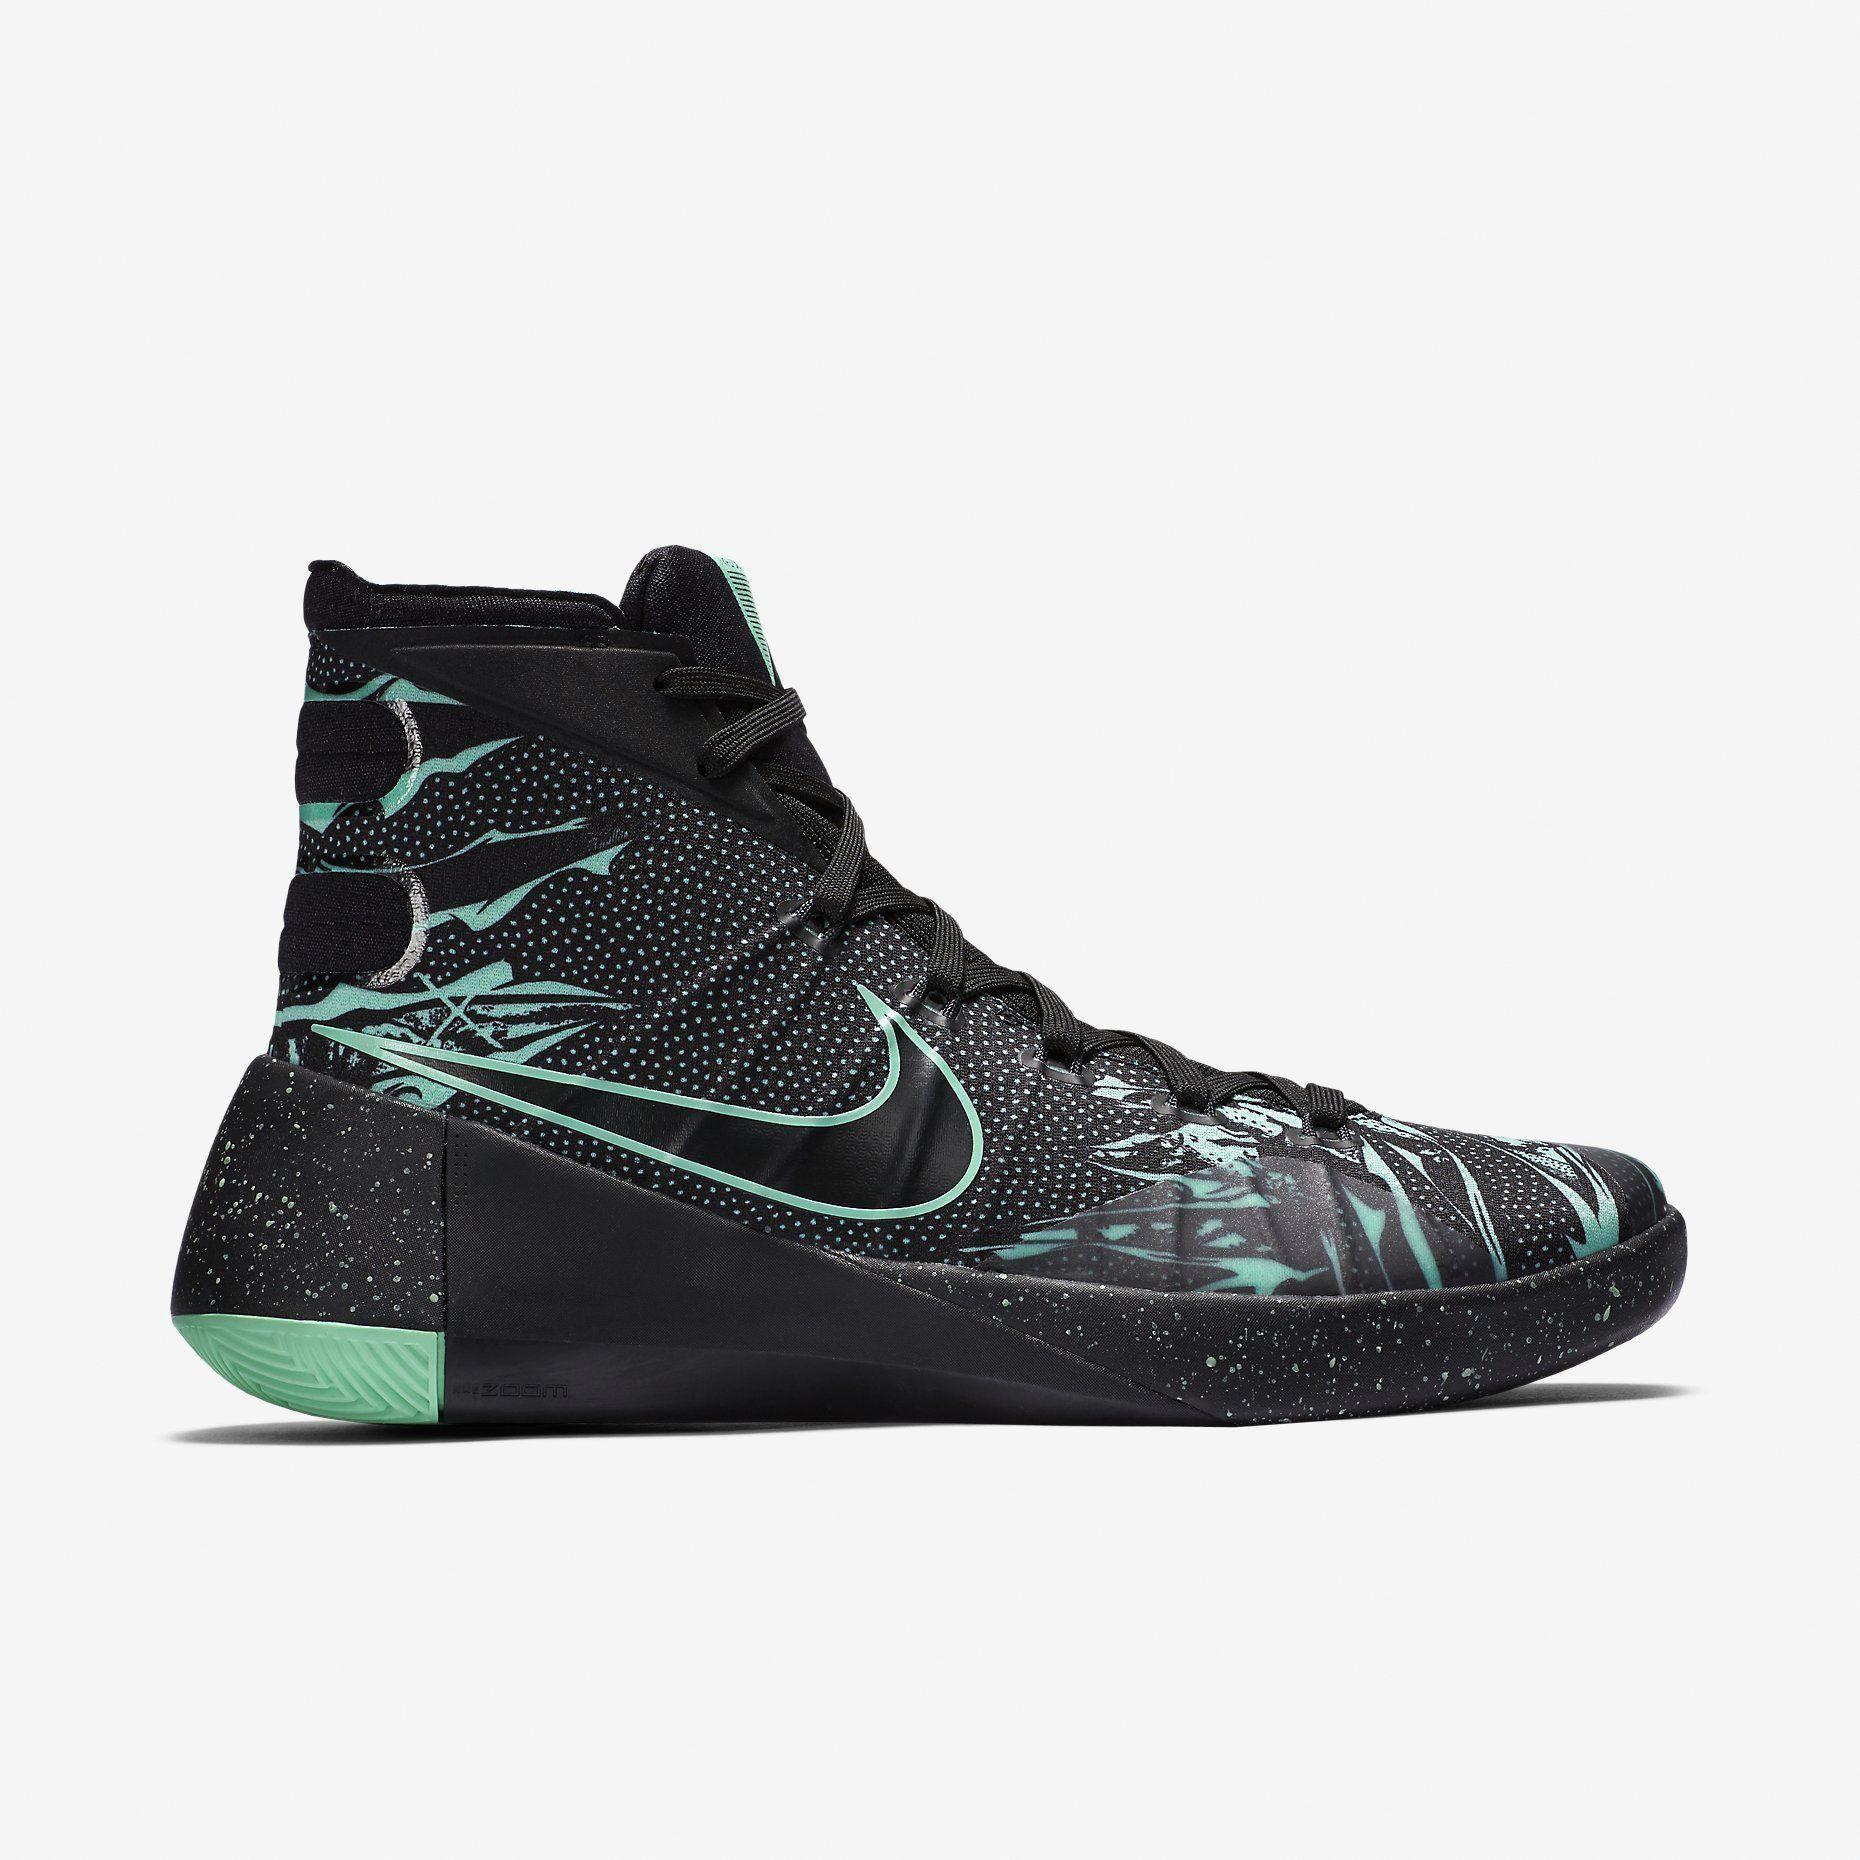 Basketball Shoes Girls Size 3 Boys